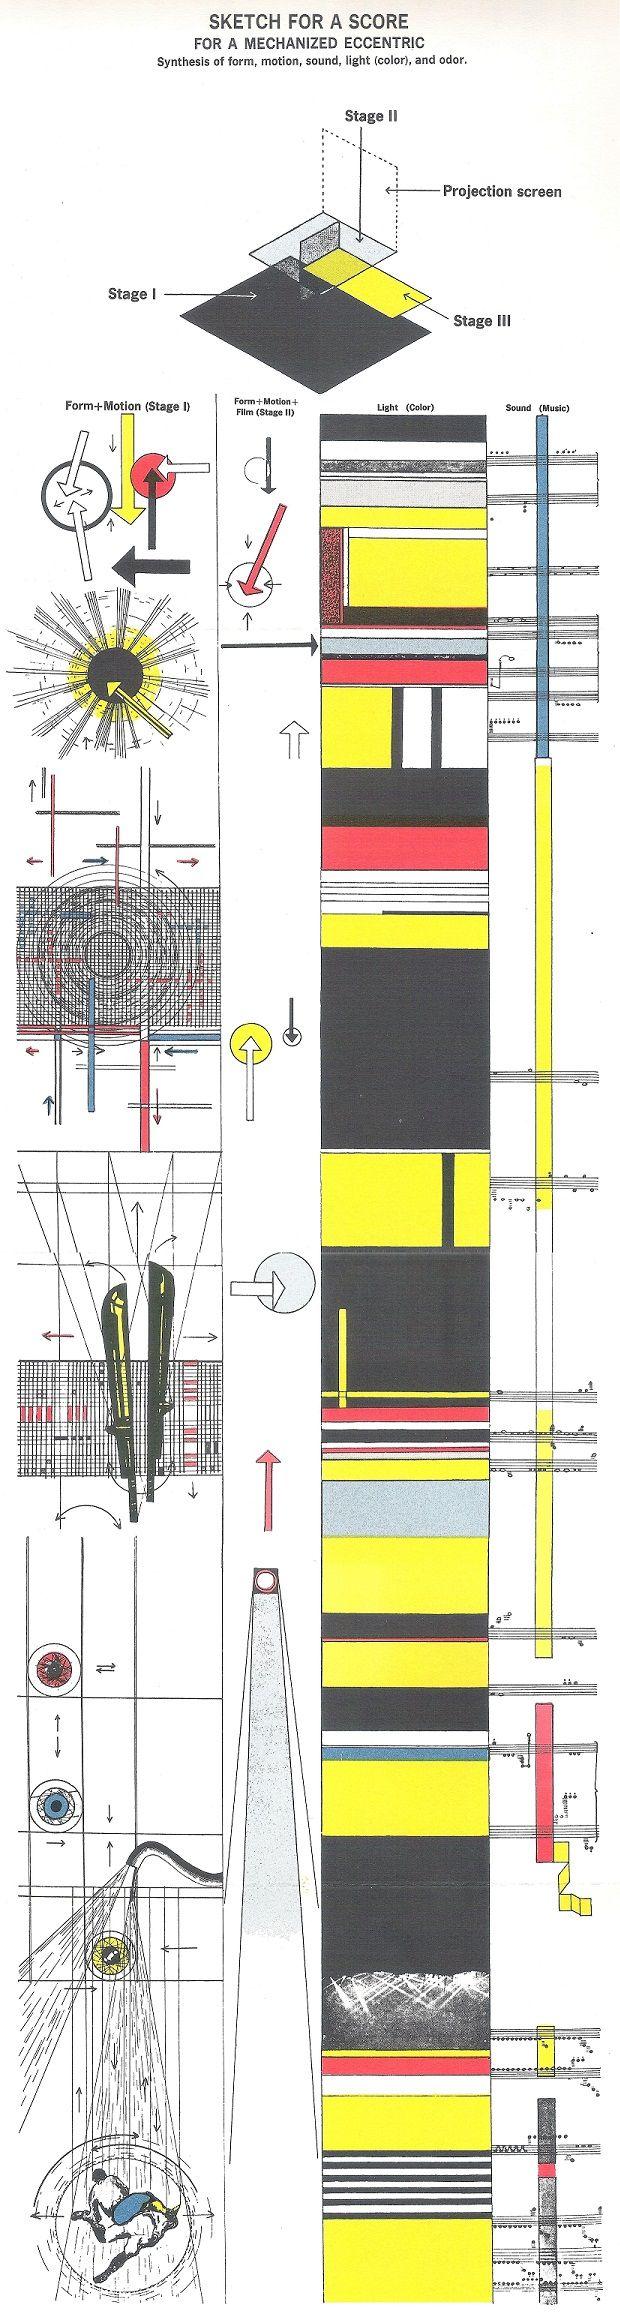 László Moholy-Nagy - Sketch for a Score for a Mechanized Eccentric (1920)